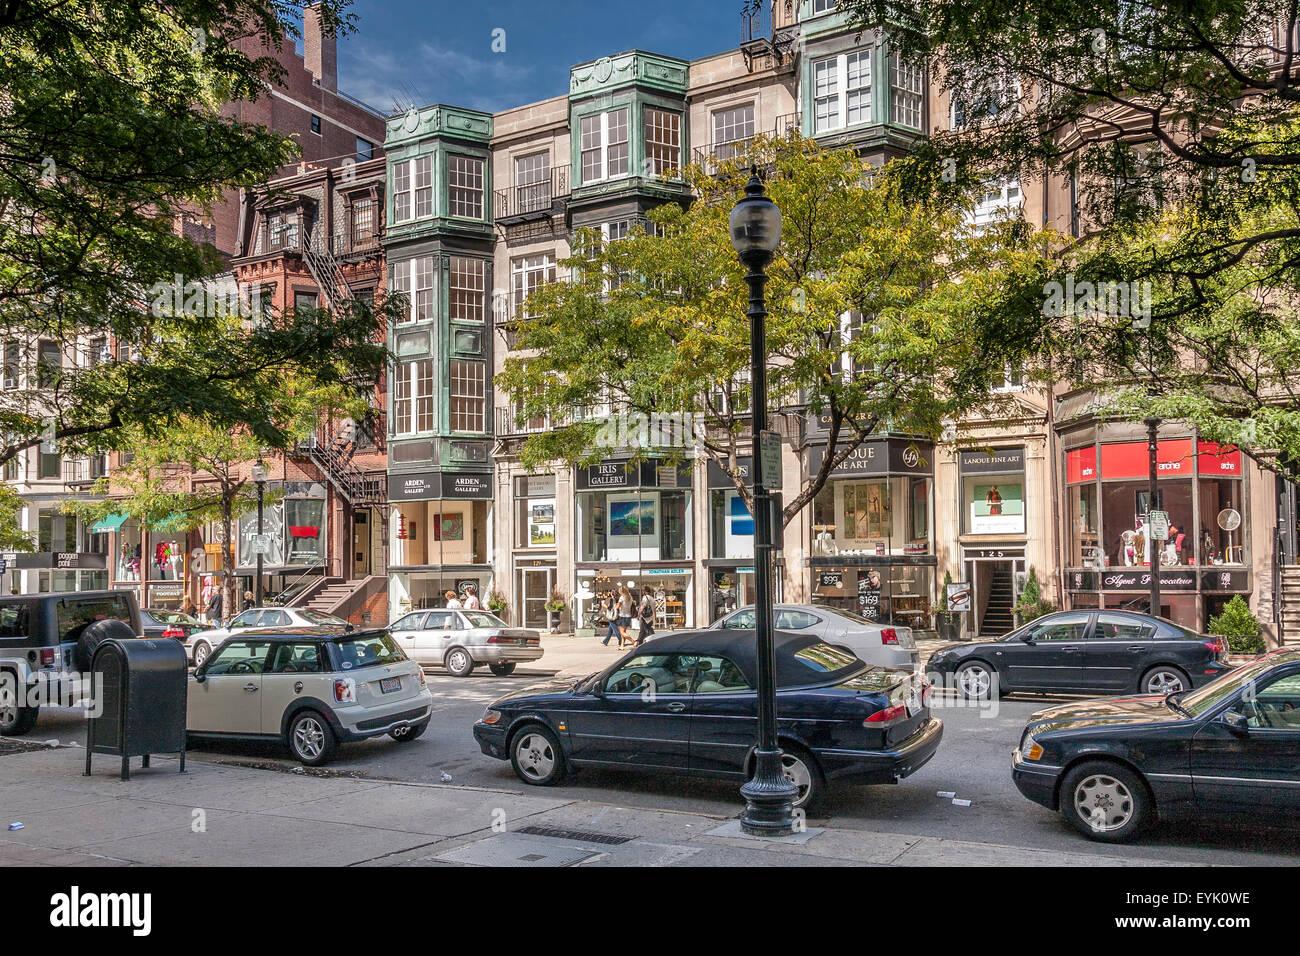 Shoppers and visitors along Newbury Street ,Boston's premier shopping destination, Boston ,Massachusetts - Stock Image